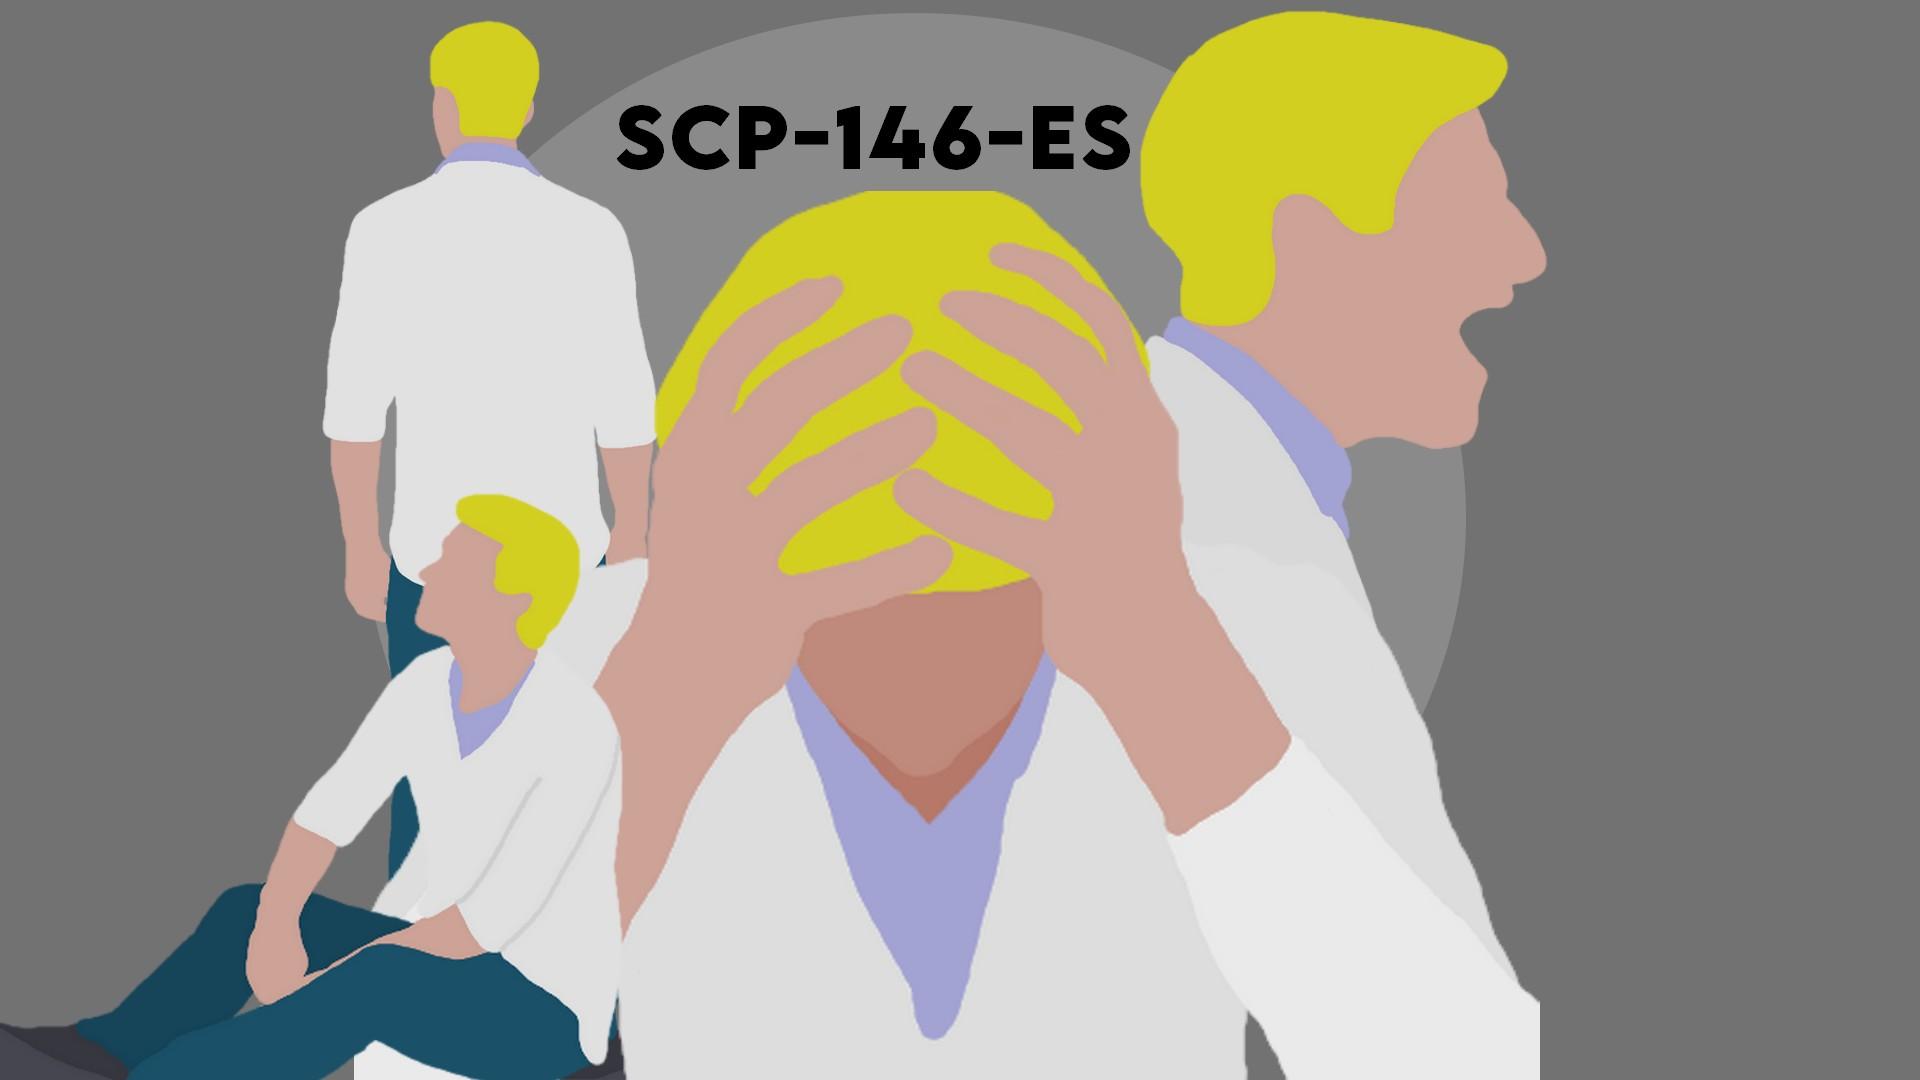 scp-146-es_secret_santa_2020.jpg